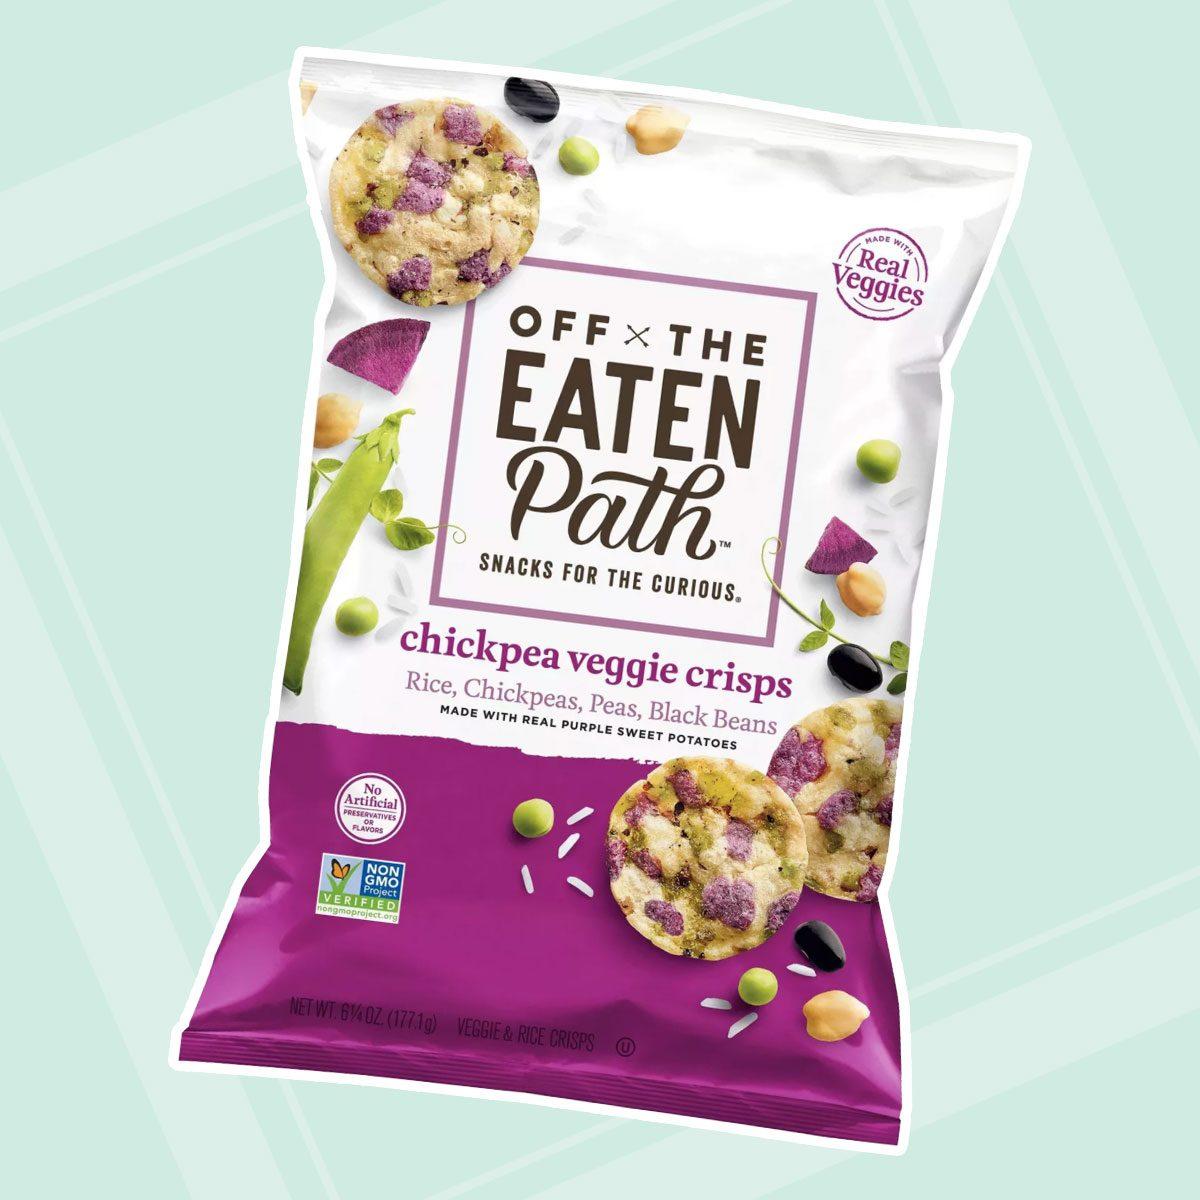 Off The Eaten Path Chickpea Veggie Crisps - 6.25oz